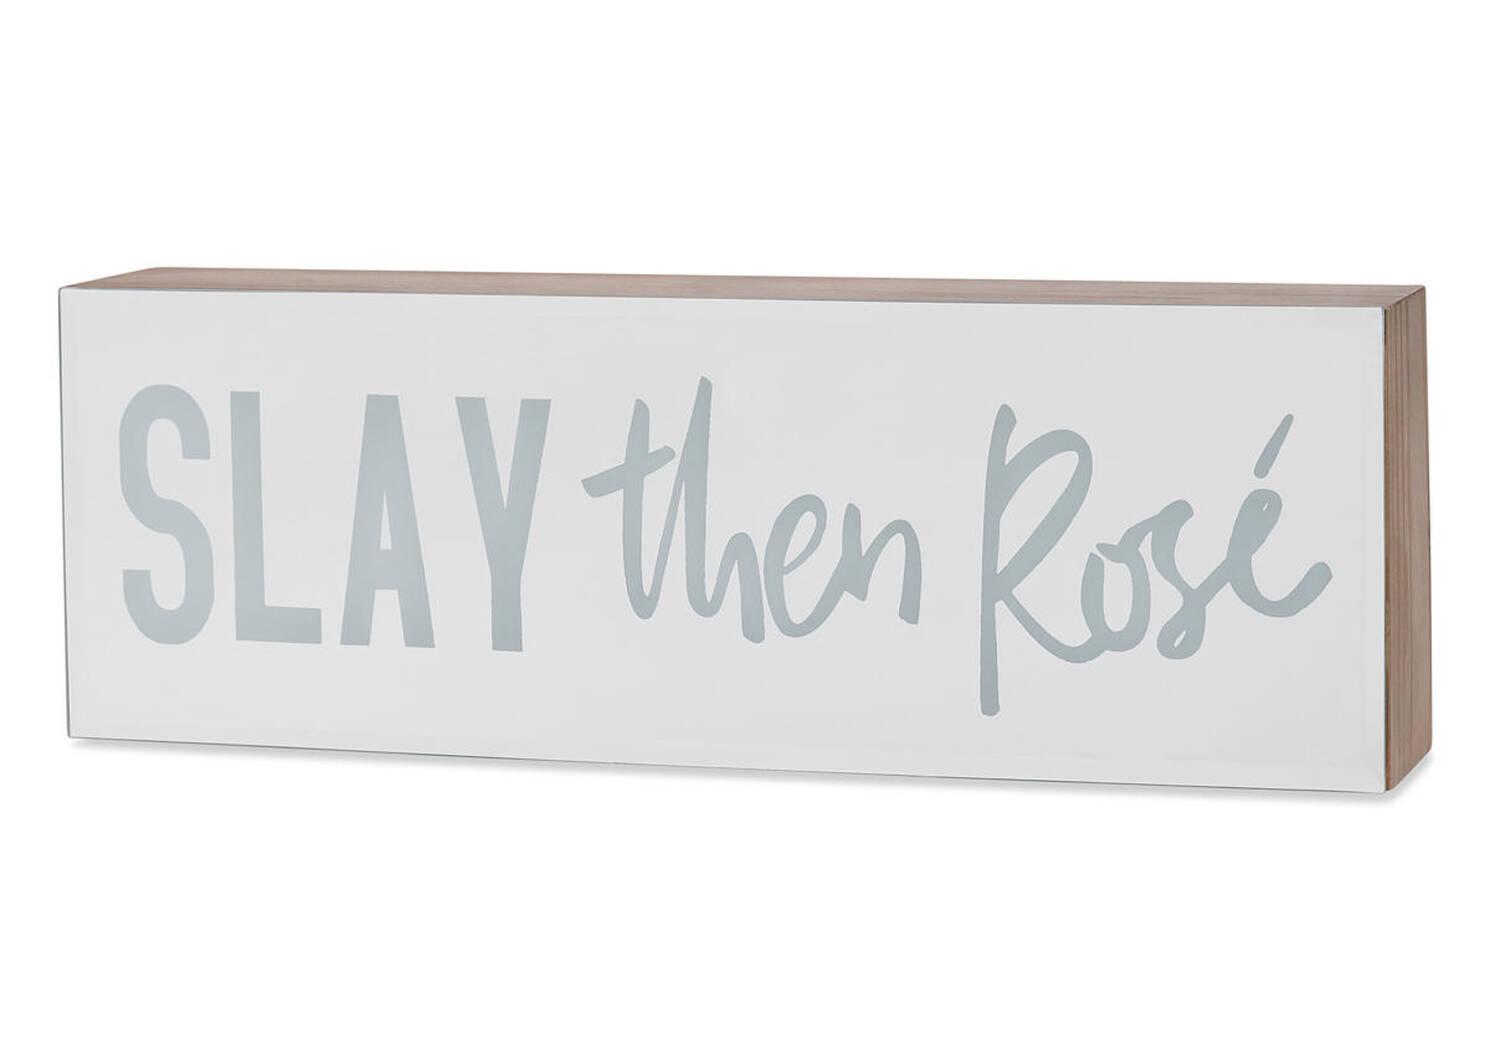 Slay then Rosé Mirror Block